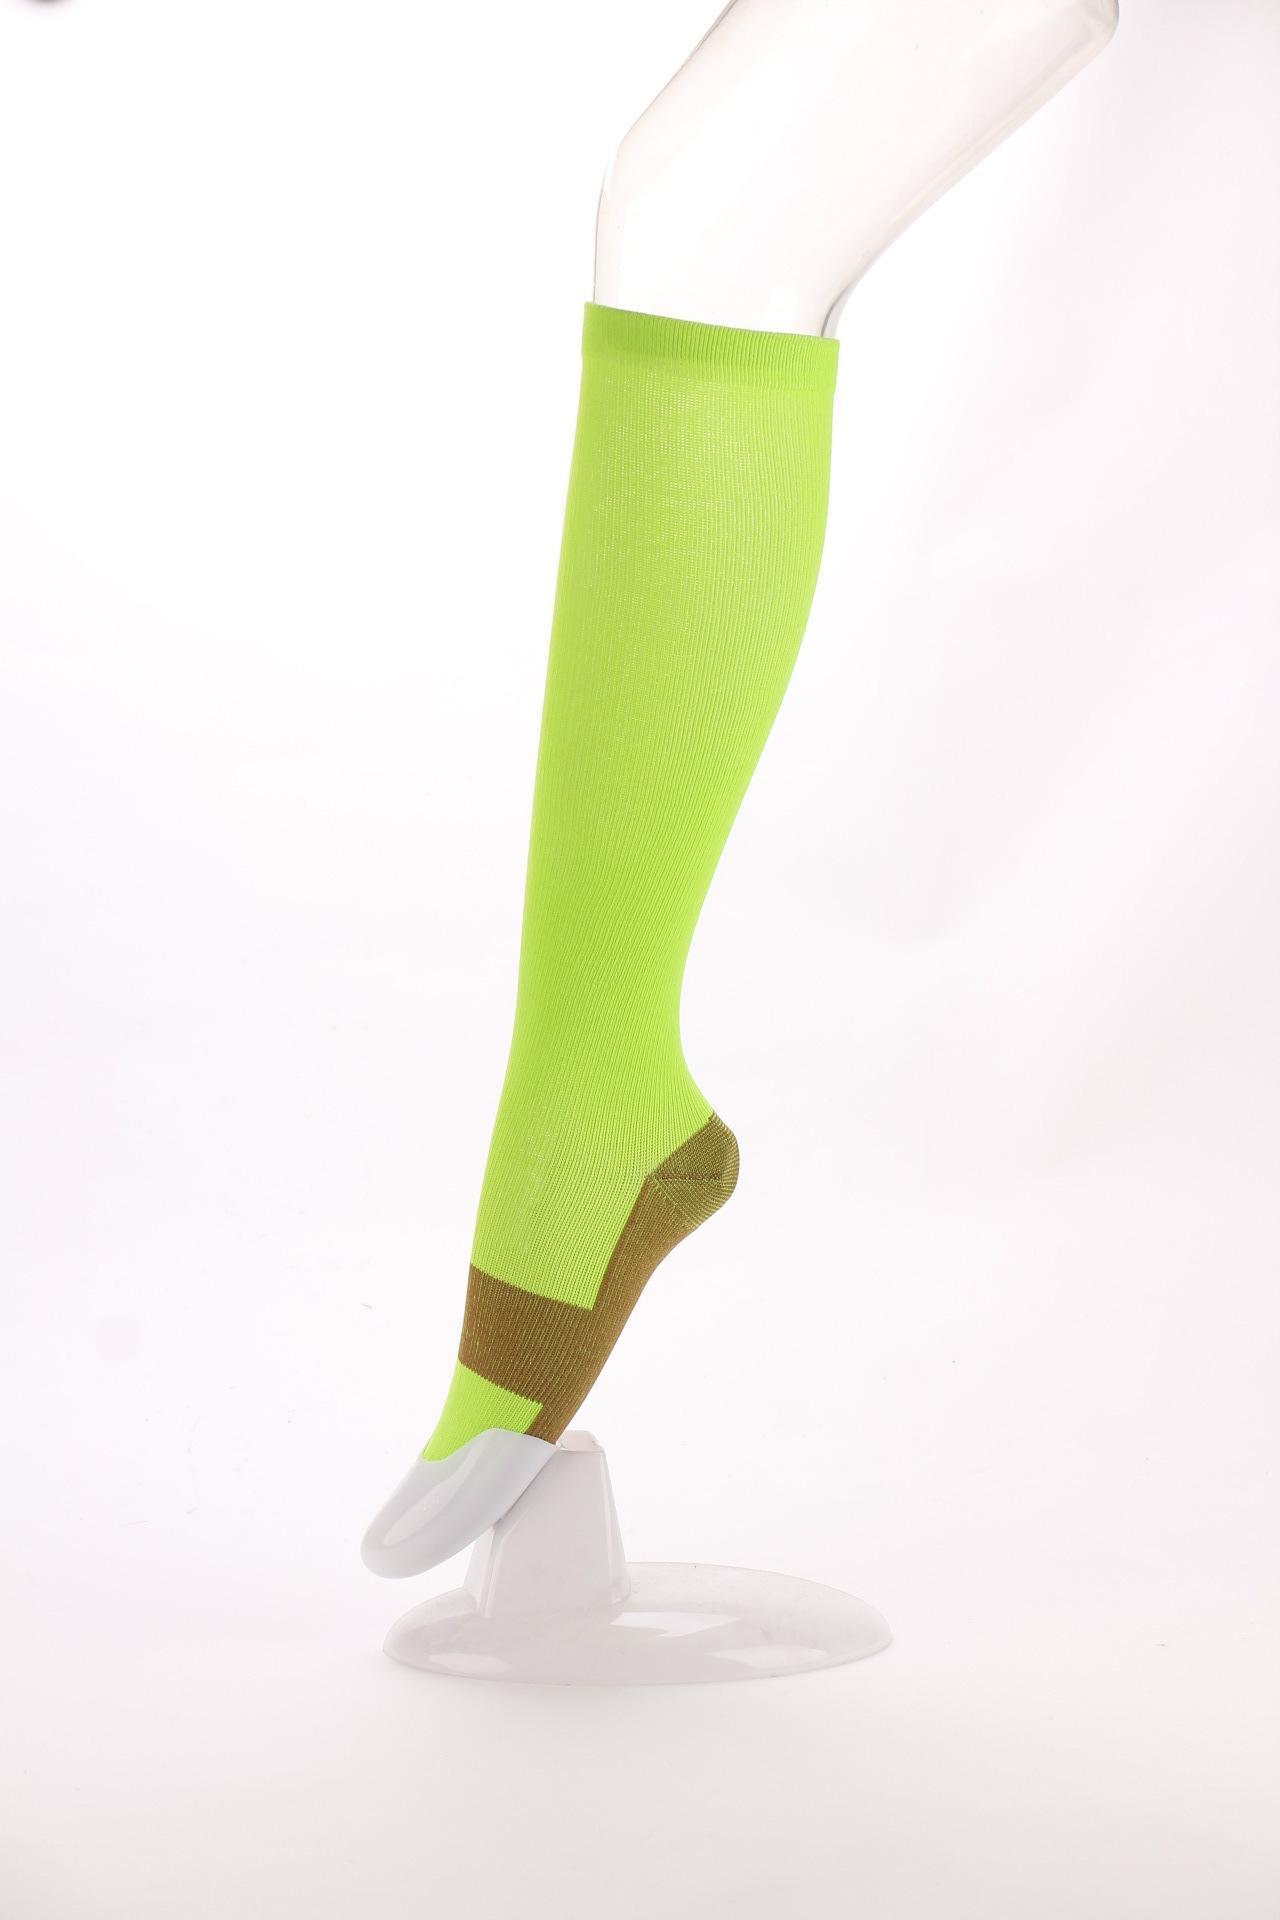 explosions Compression socks Comfortable anti fatigue magic foreign trade Unisex socks nylon pressure Compression sports socks